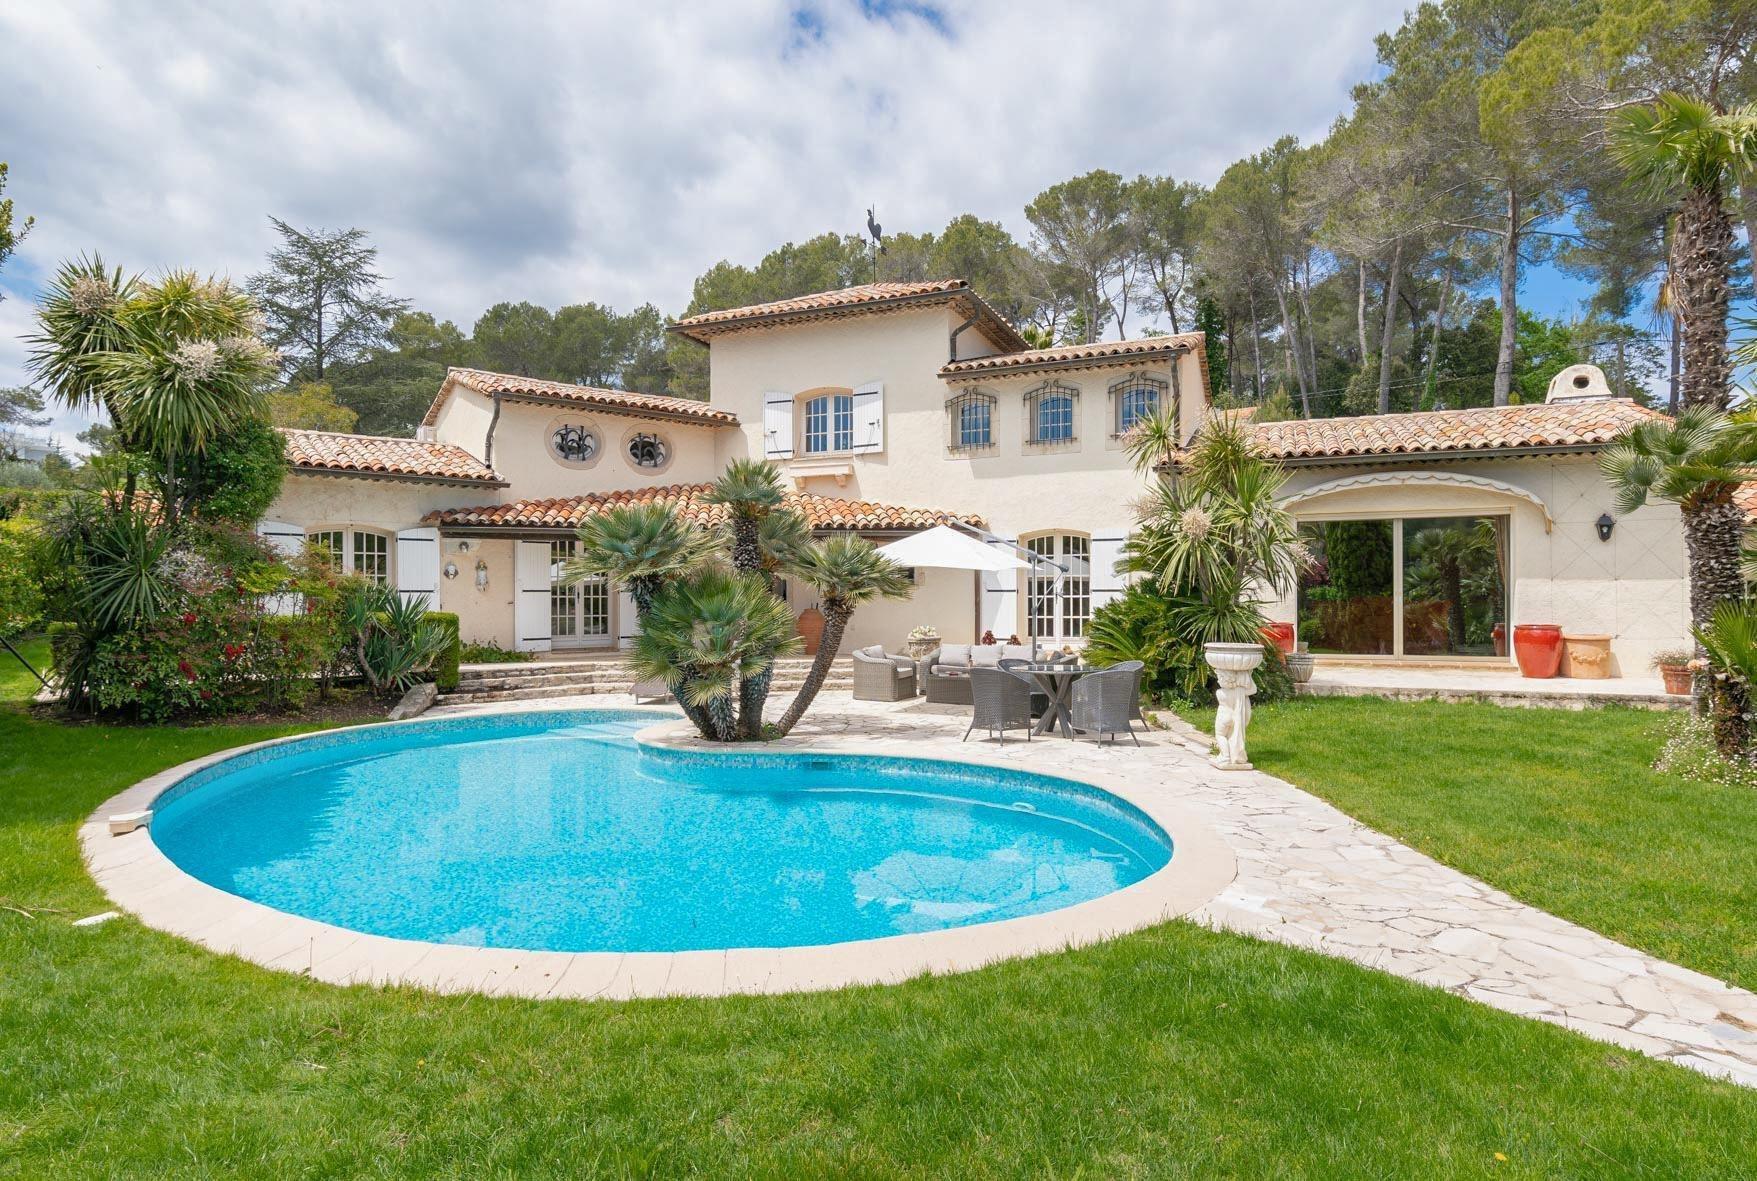 Villa in Mougins, Provence-Alpes-Côte d'Azur, France 1 - 10663788